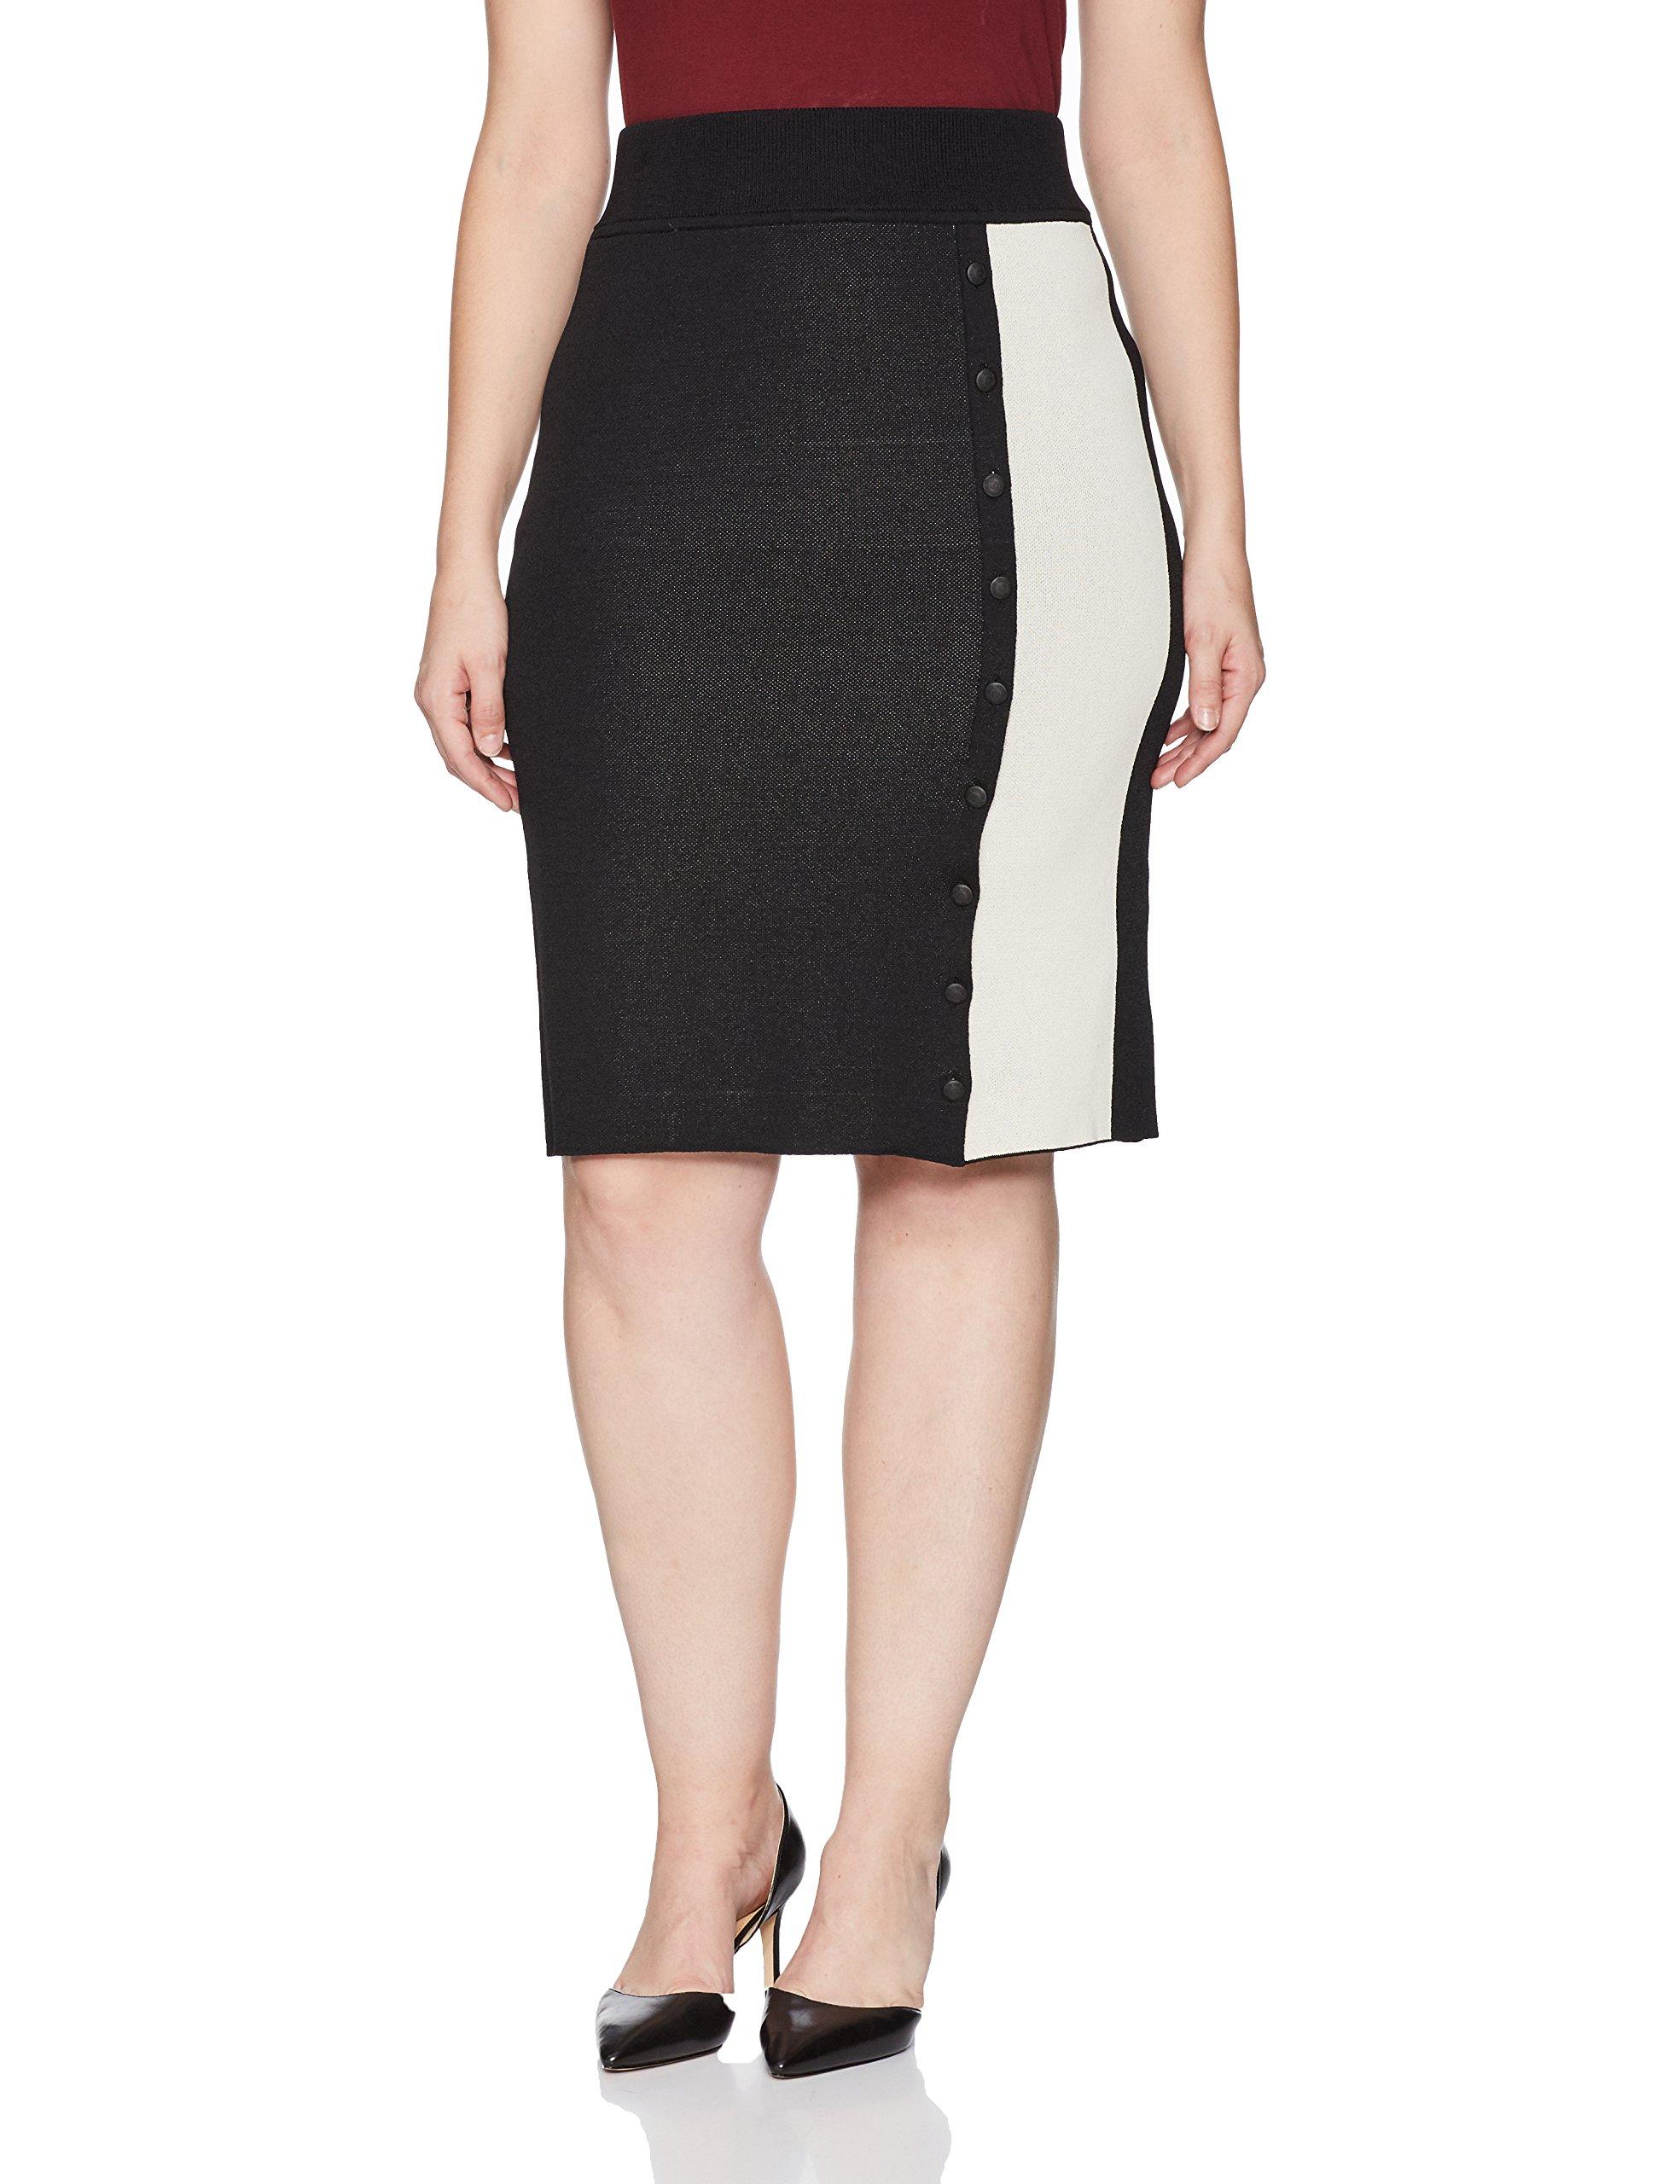 RACHEL Rachel Roy Women's Plus Size Striped Button Front Skirt, Black/Cream, 3X by RACHEL Rachel Roy